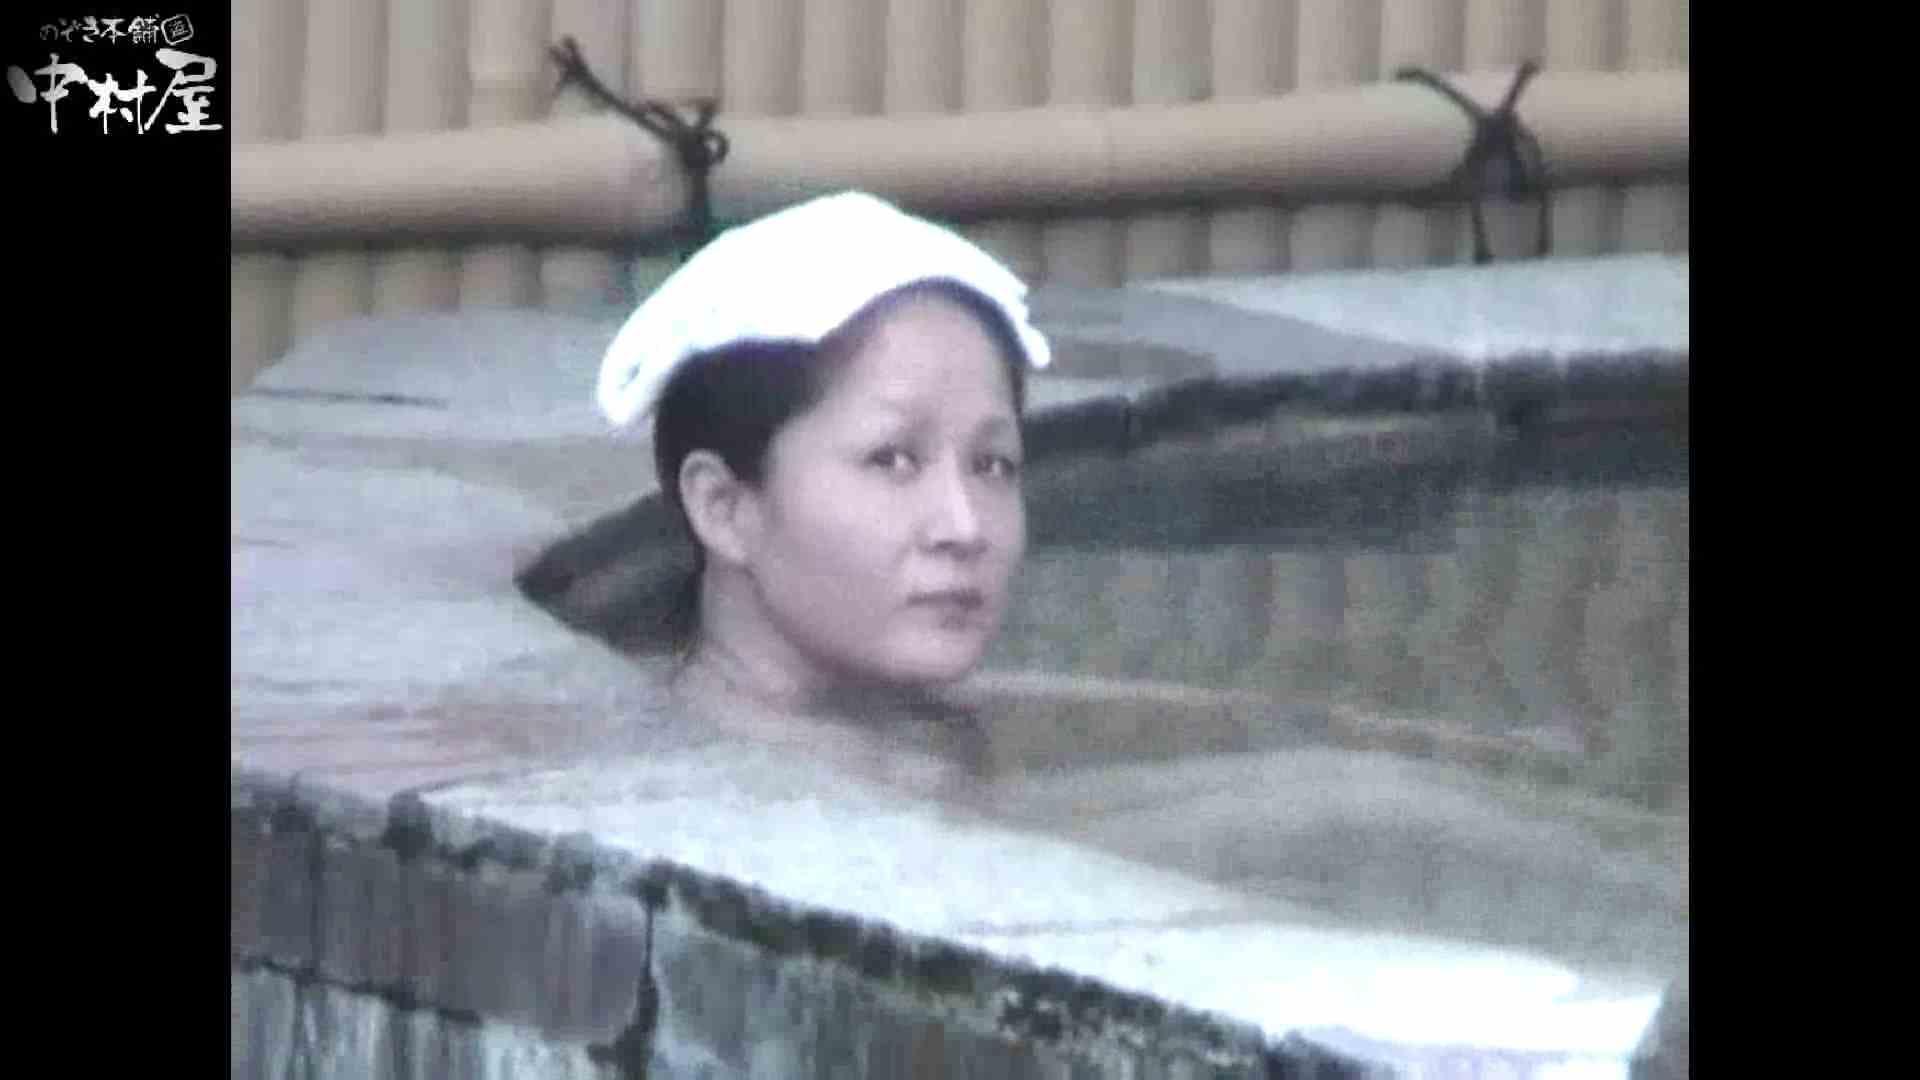 Aquaな露天風呂Vol.880潜入盗撮露天風呂十六判湯 其の六 露天 | 潜入シリーズ  95pic 60